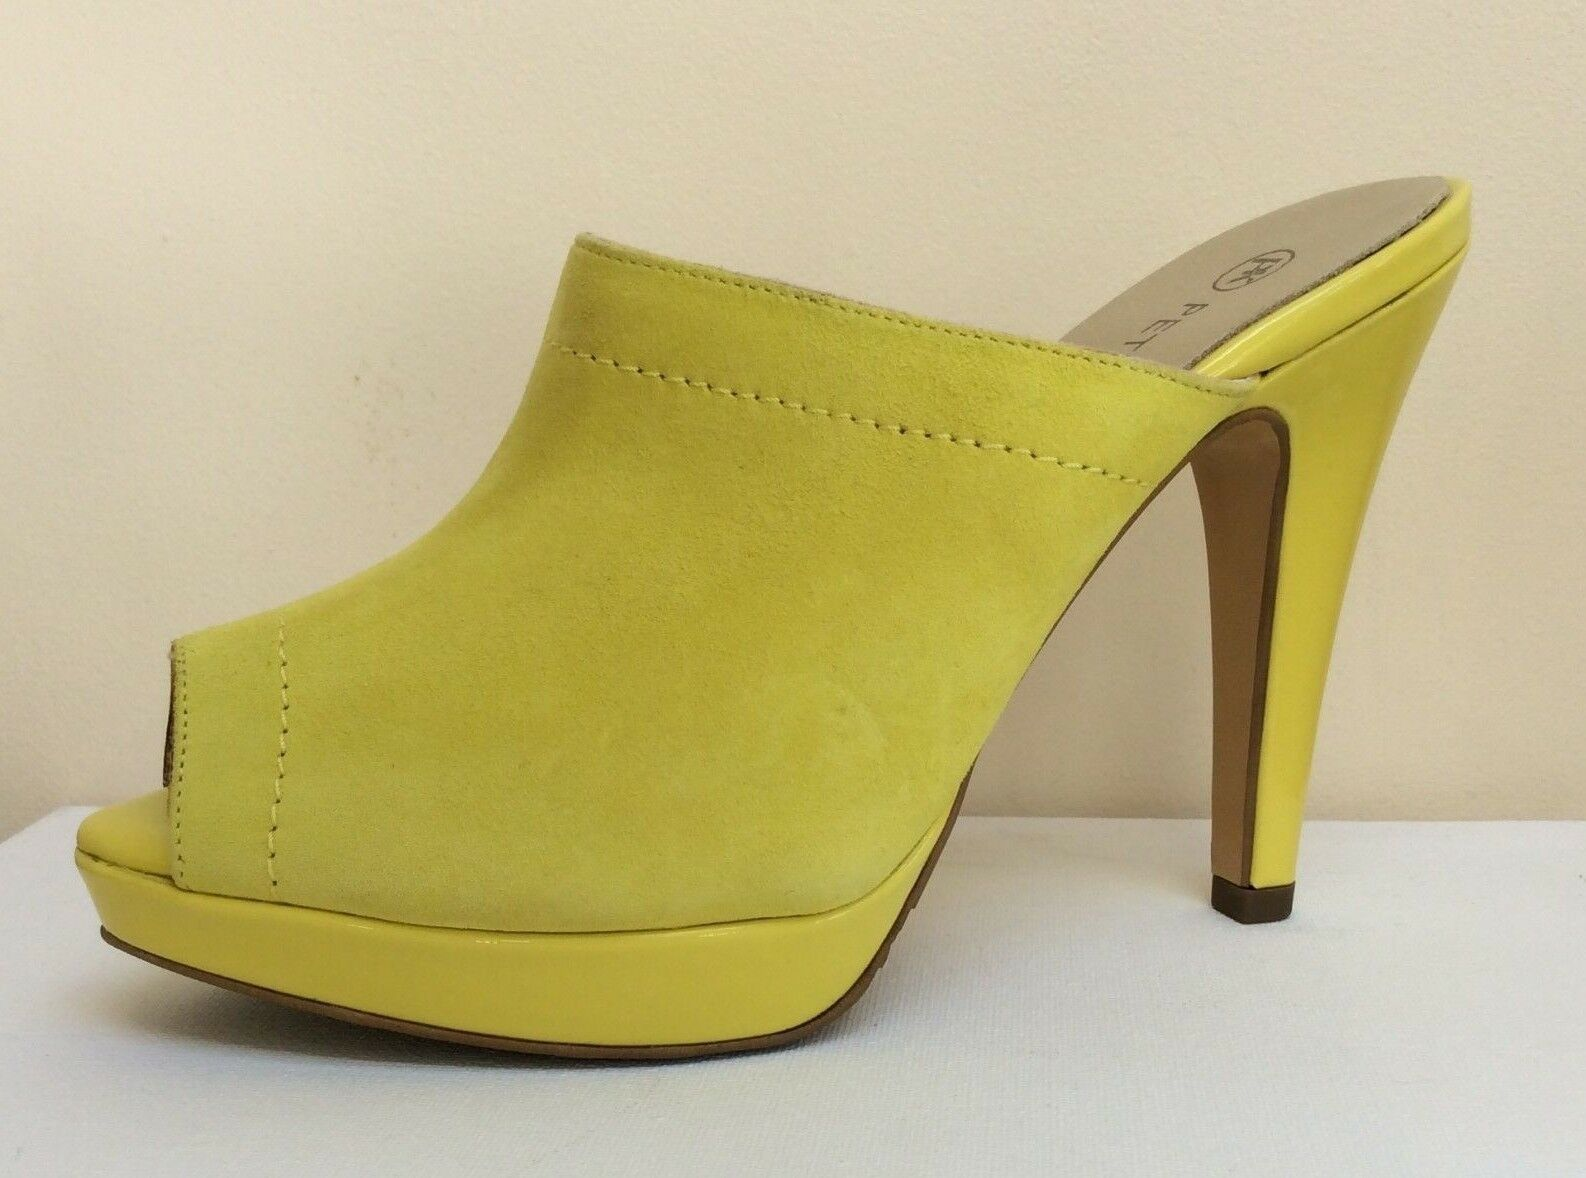 Peter Kaiser Palia lemon-yellow suede/patent mules, UK 5/EU 38,    BNWB